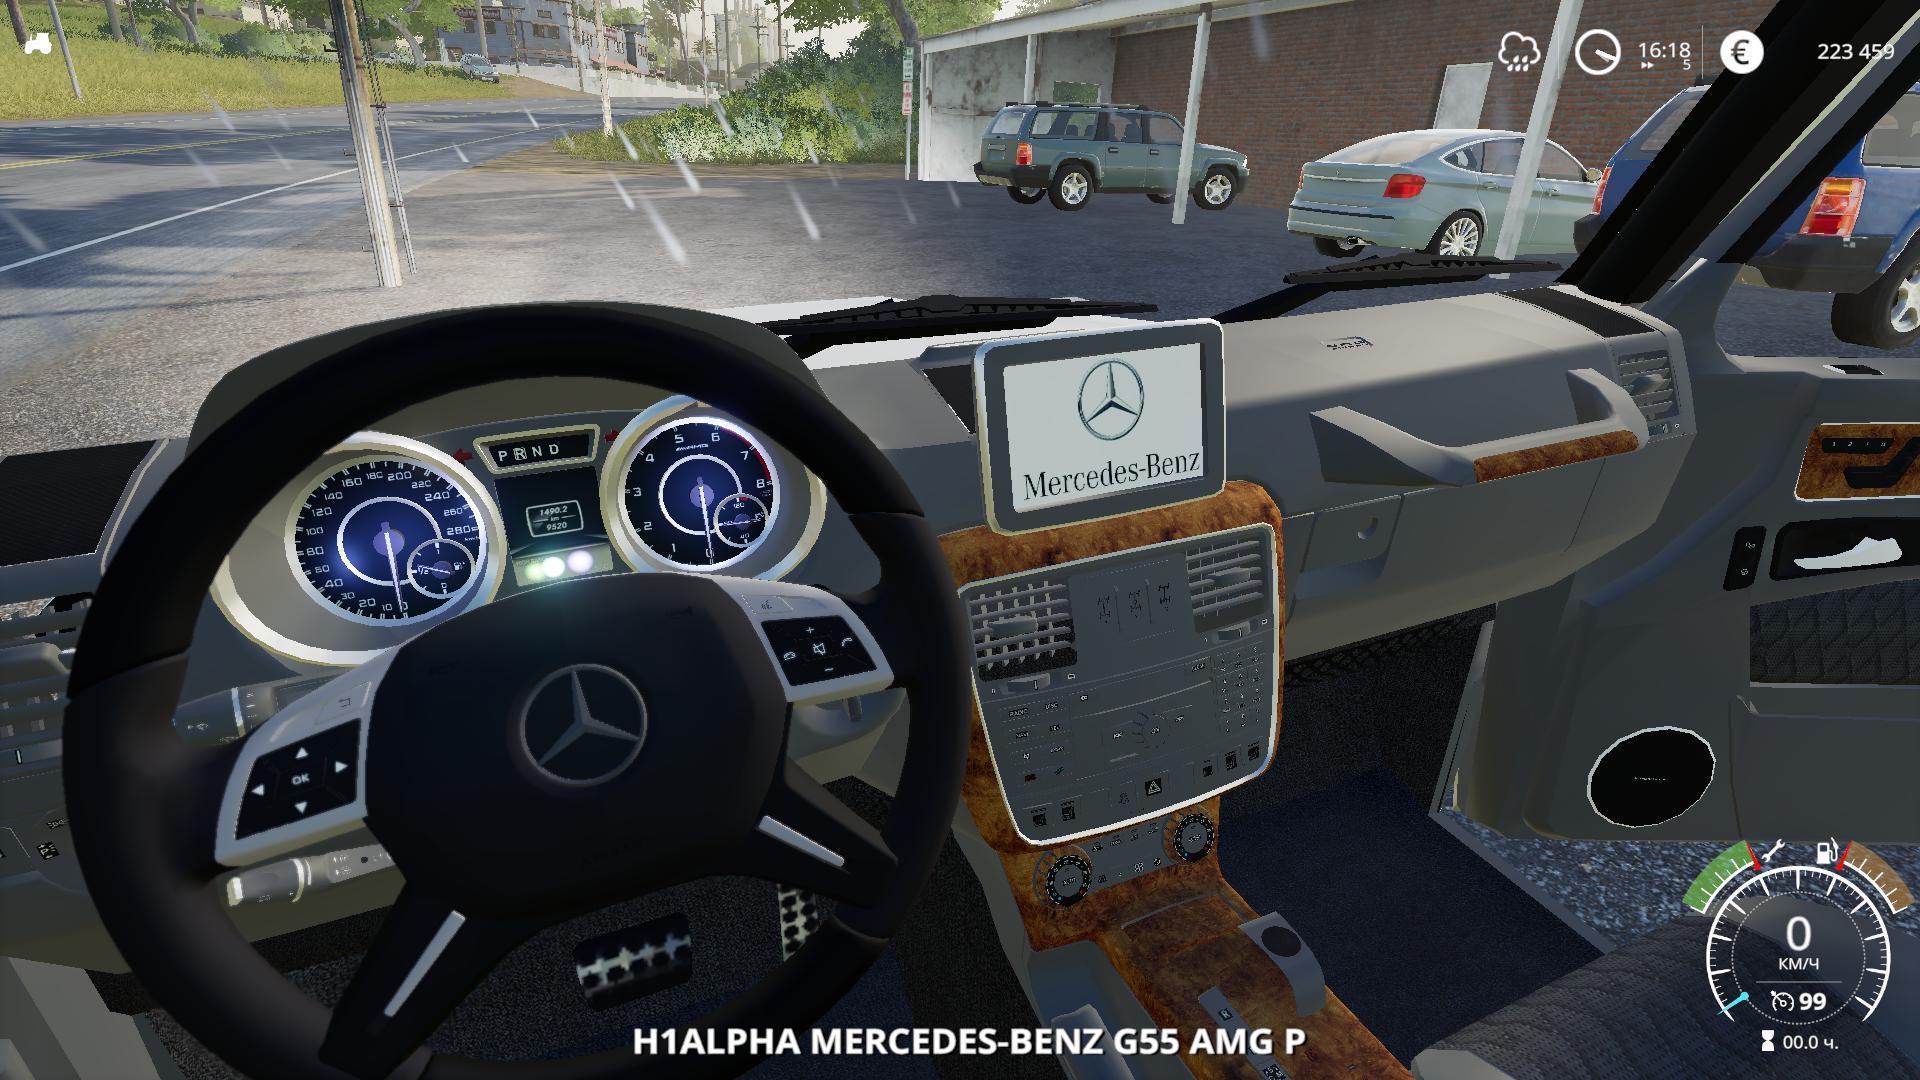 FS19 - Mercedes-Benz G55 AMG Police V1.0